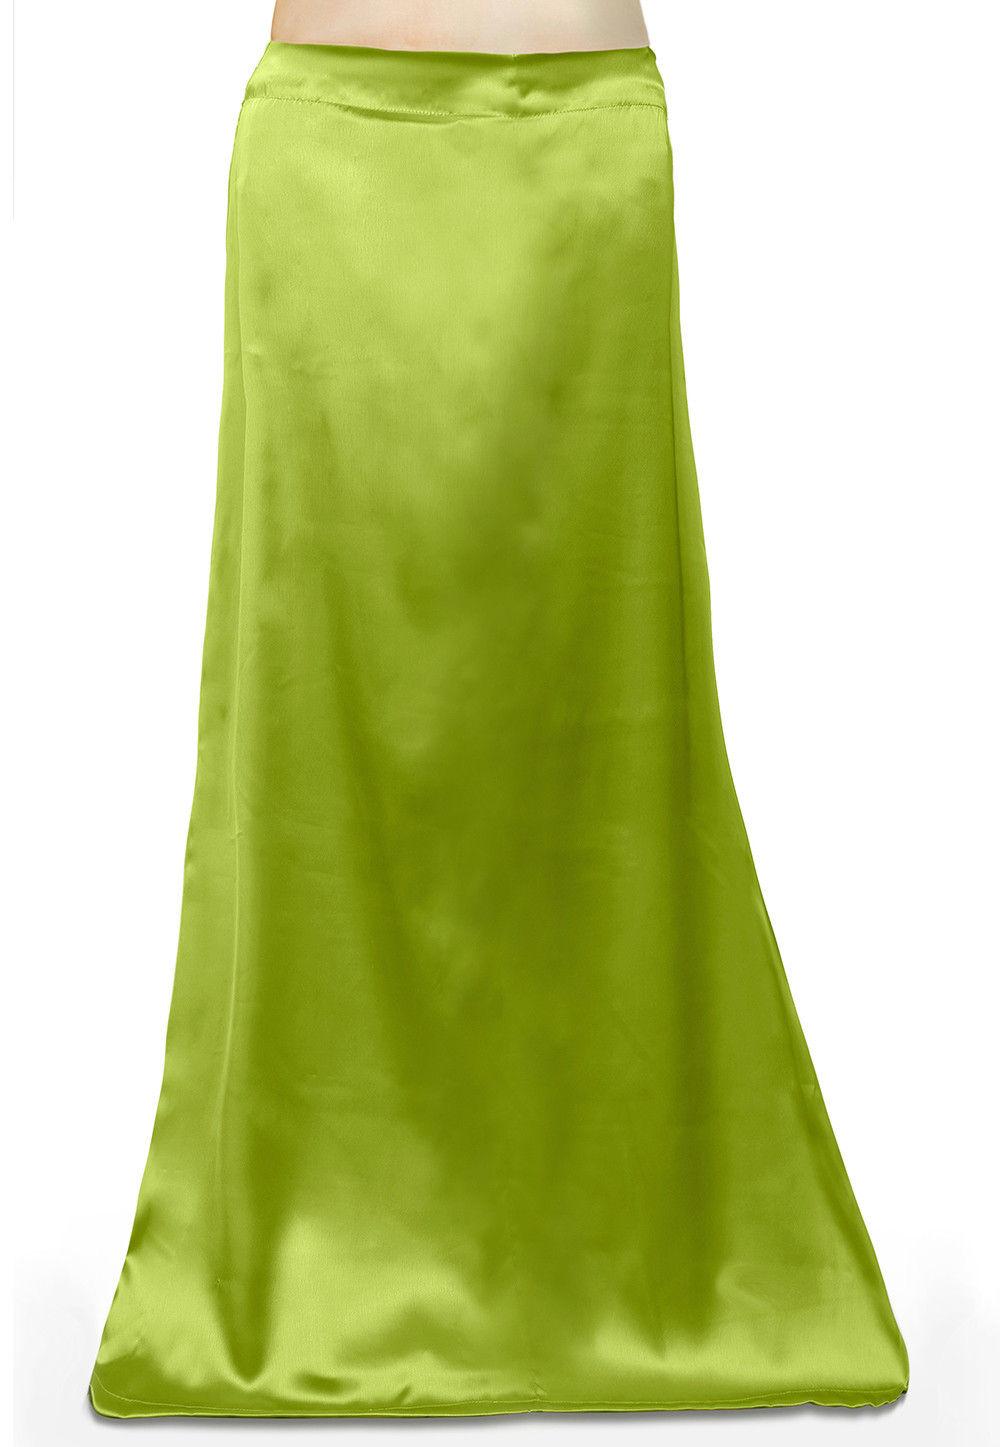 Plain Satin Readymade Petticoat in Light Green